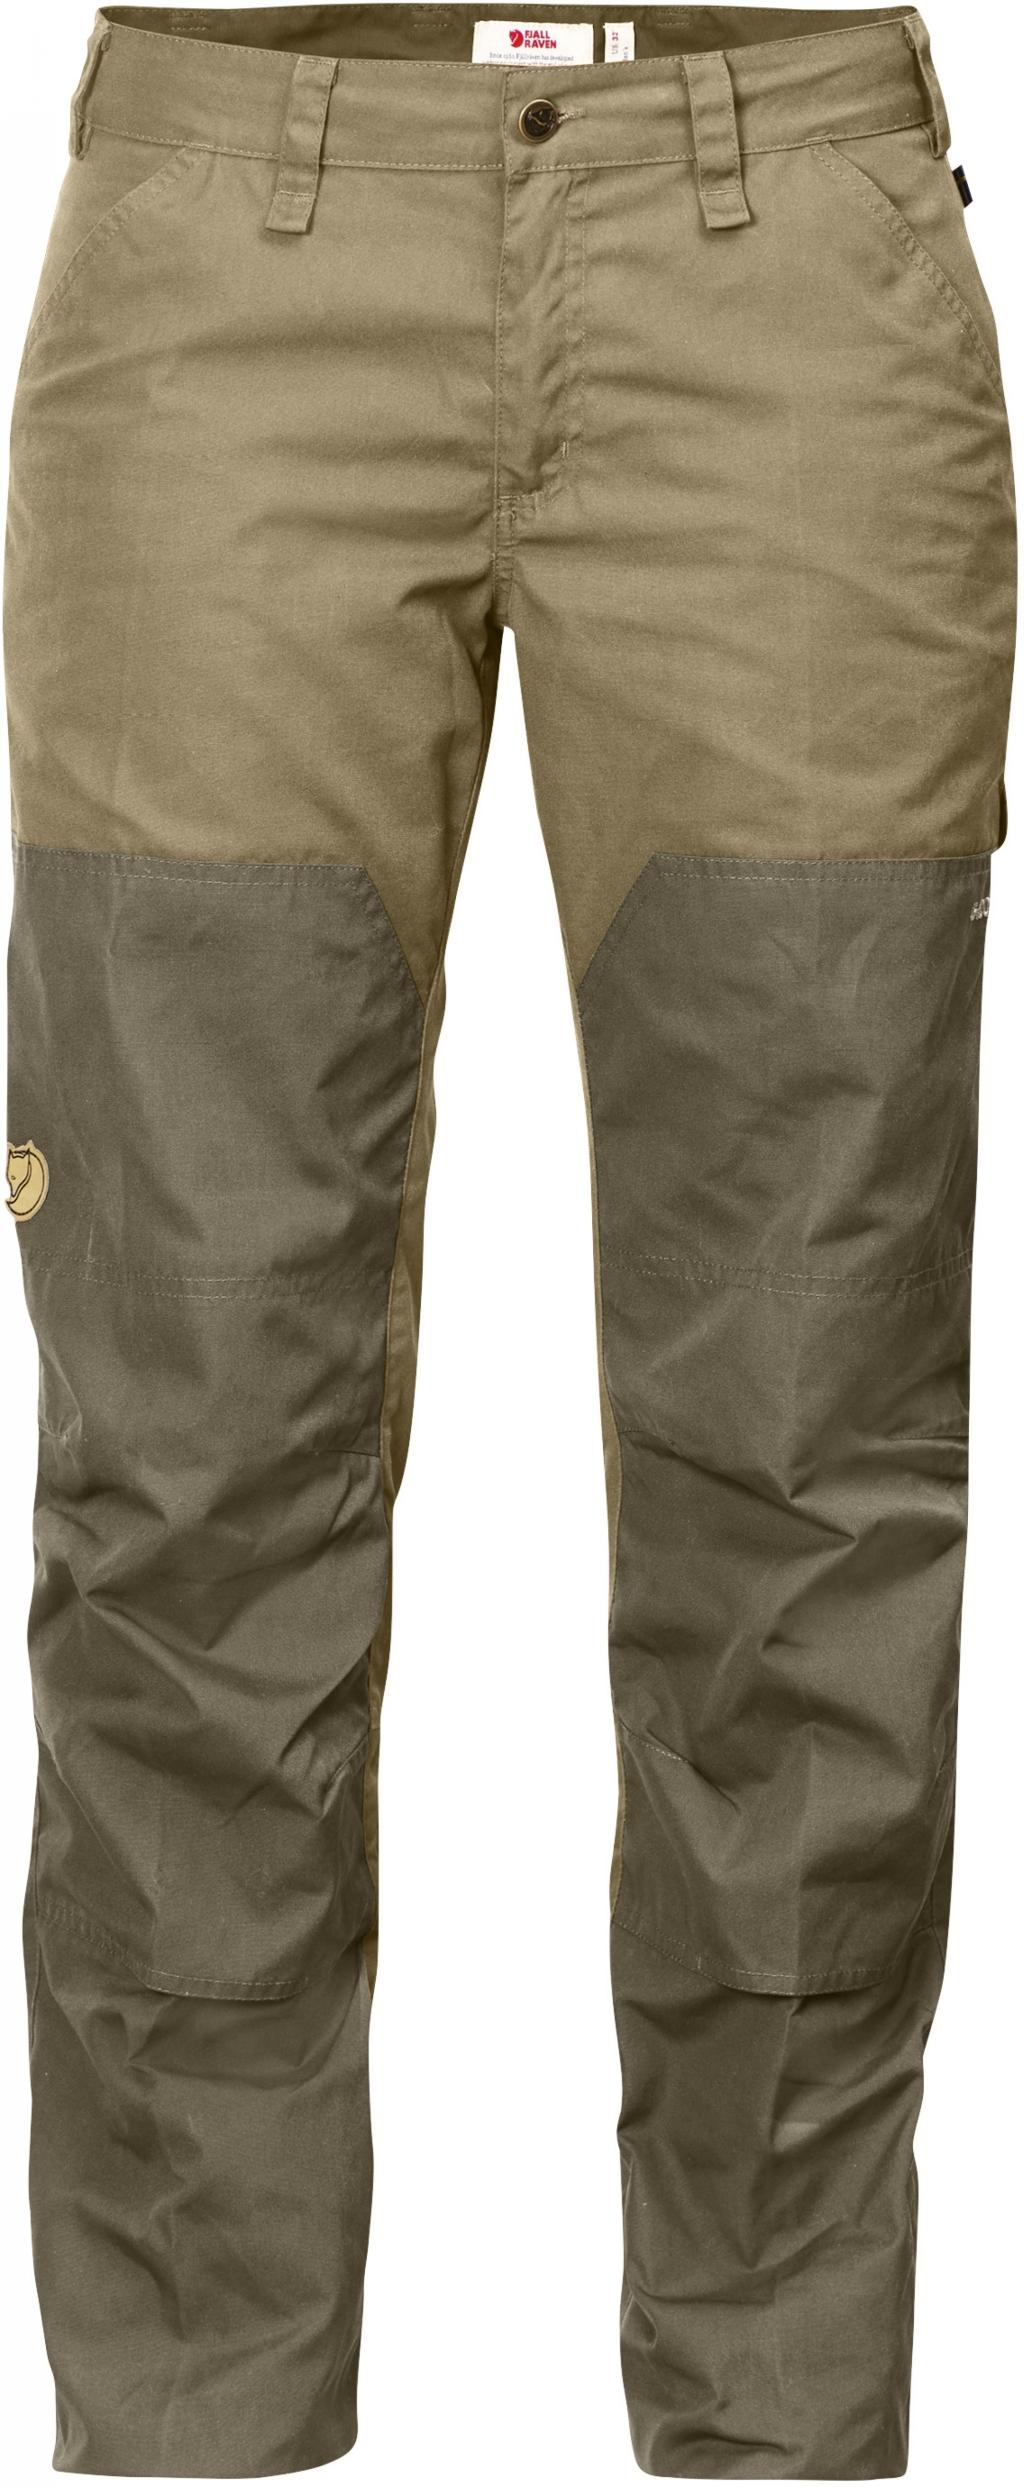 FjallRaven Barents Pro Jeans W Sand-30